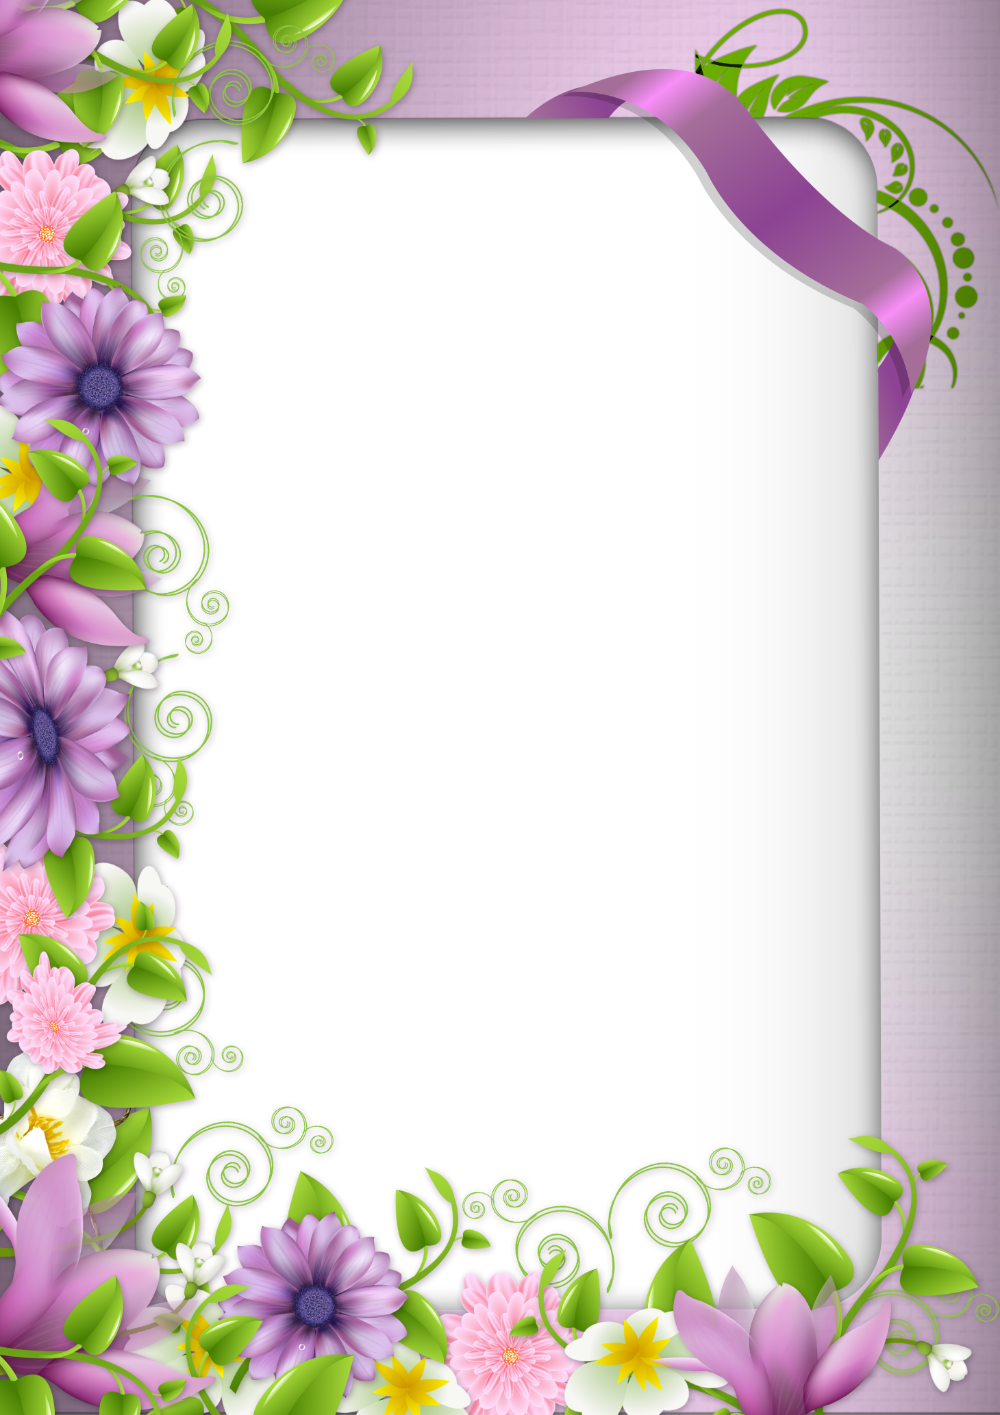 Hranice A Ramecky Okraje Pro Papir Kvetinovy Ramecek 2 Fotoramecek Png 2920x4134 Stahovani Png Flower Frame Flower Border Borders And Frames